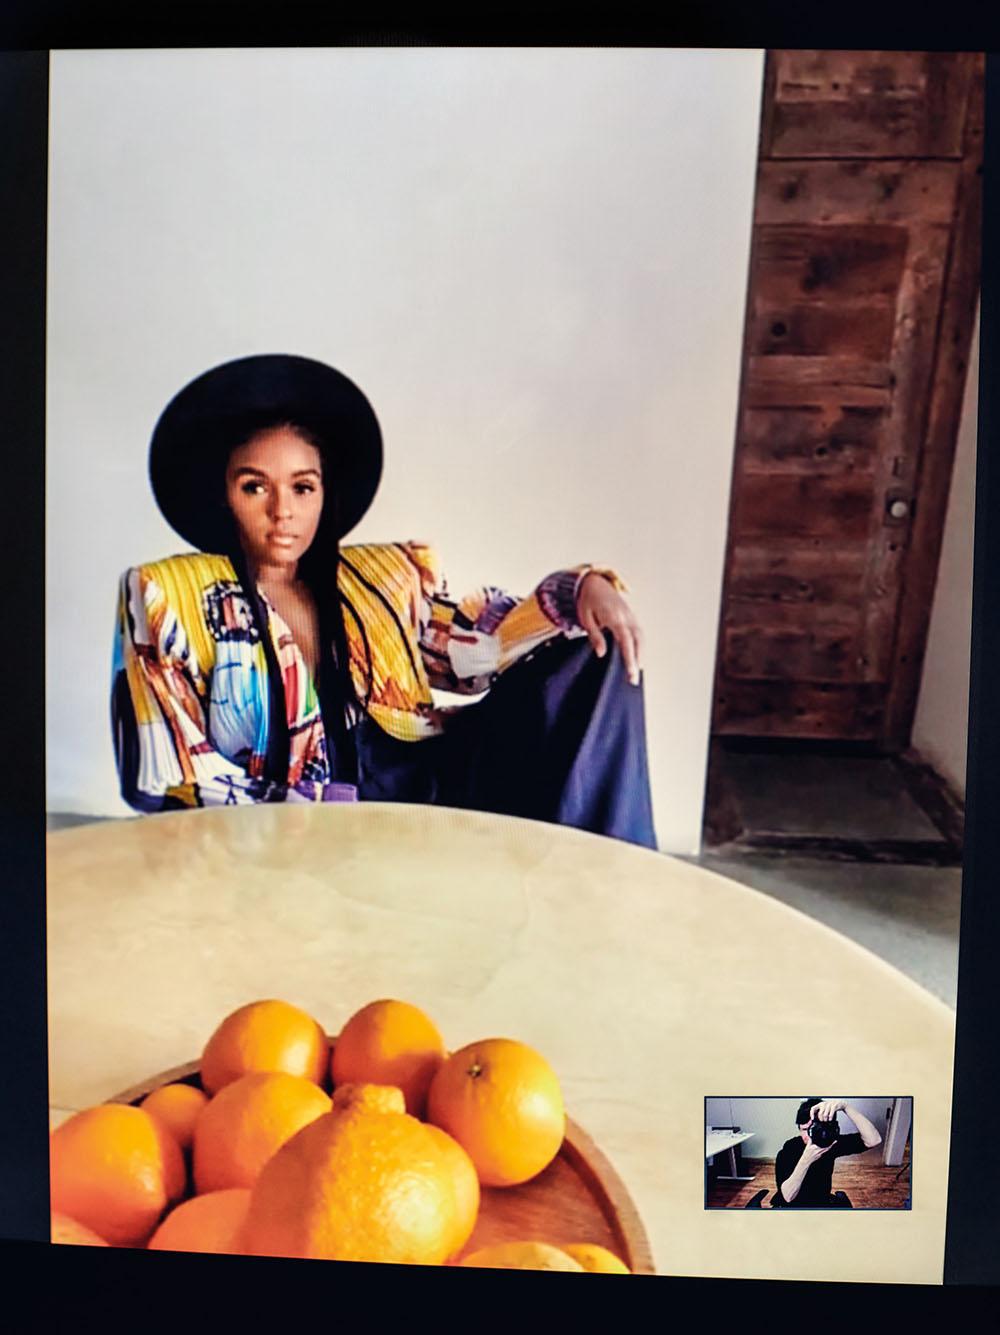 Janelle Monáe covers Vanity Fair June 2020 by Collier Schorr